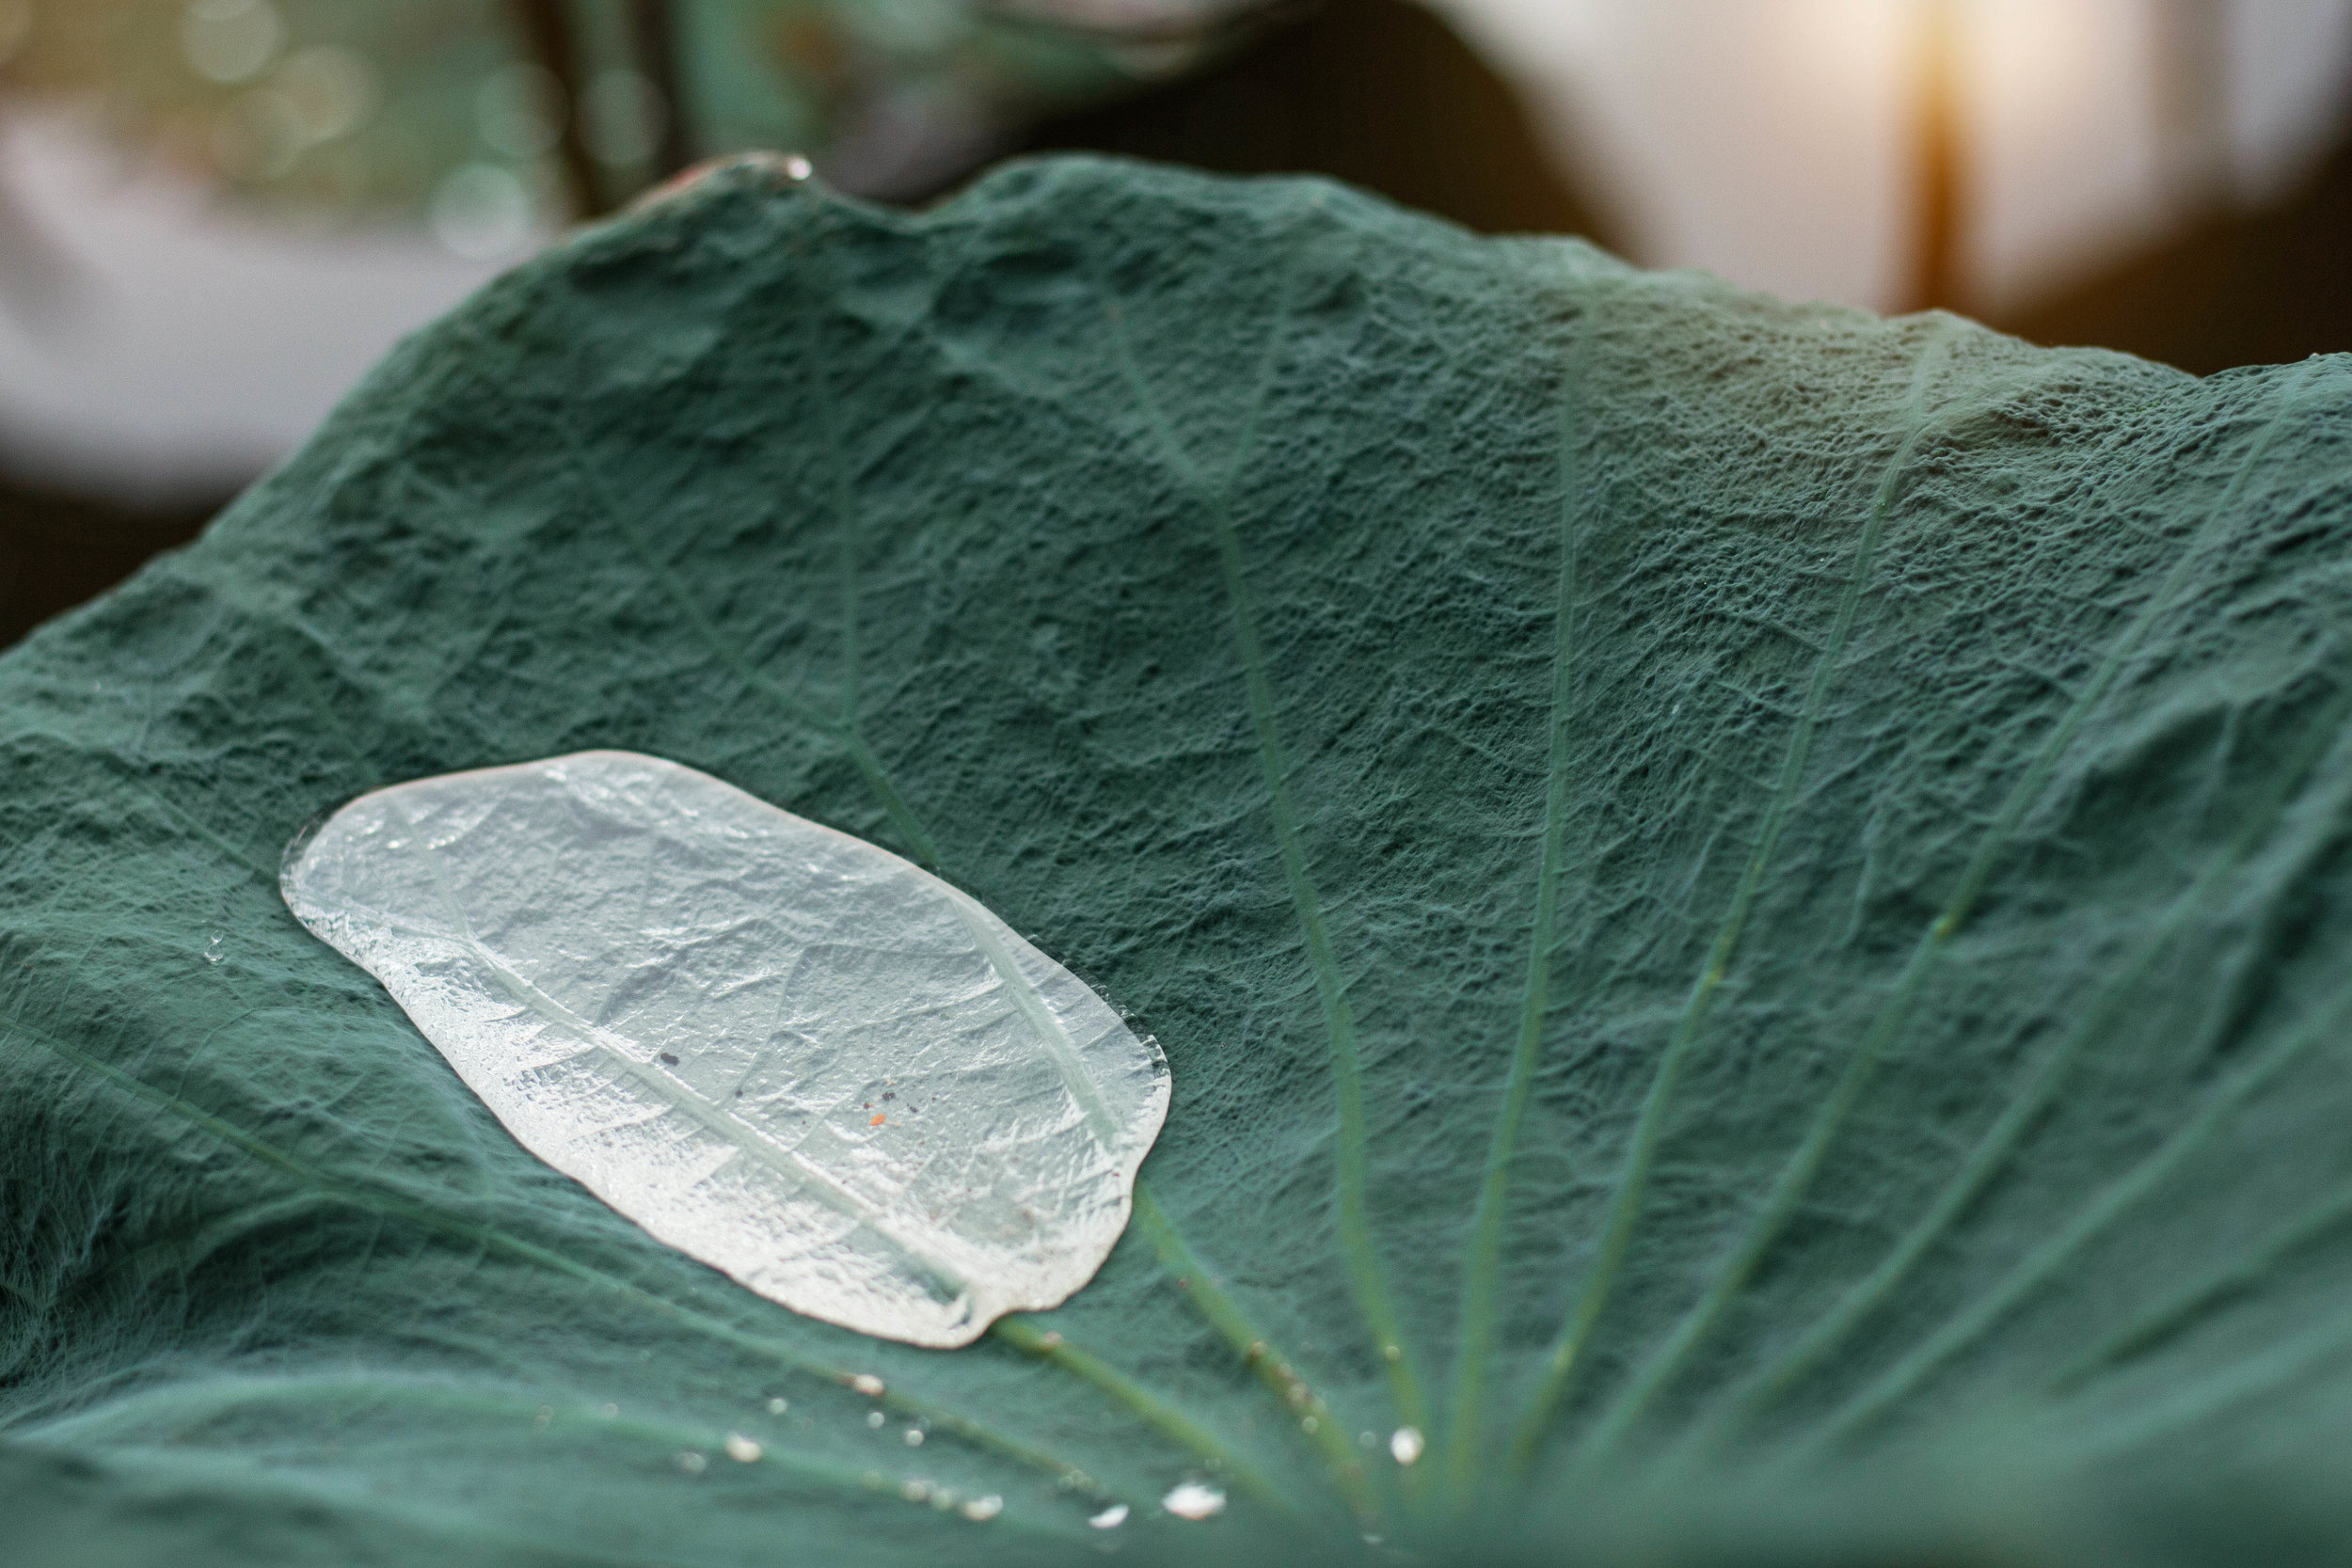 water-drops-on-leaves-after-rain-PHN565C.jpg